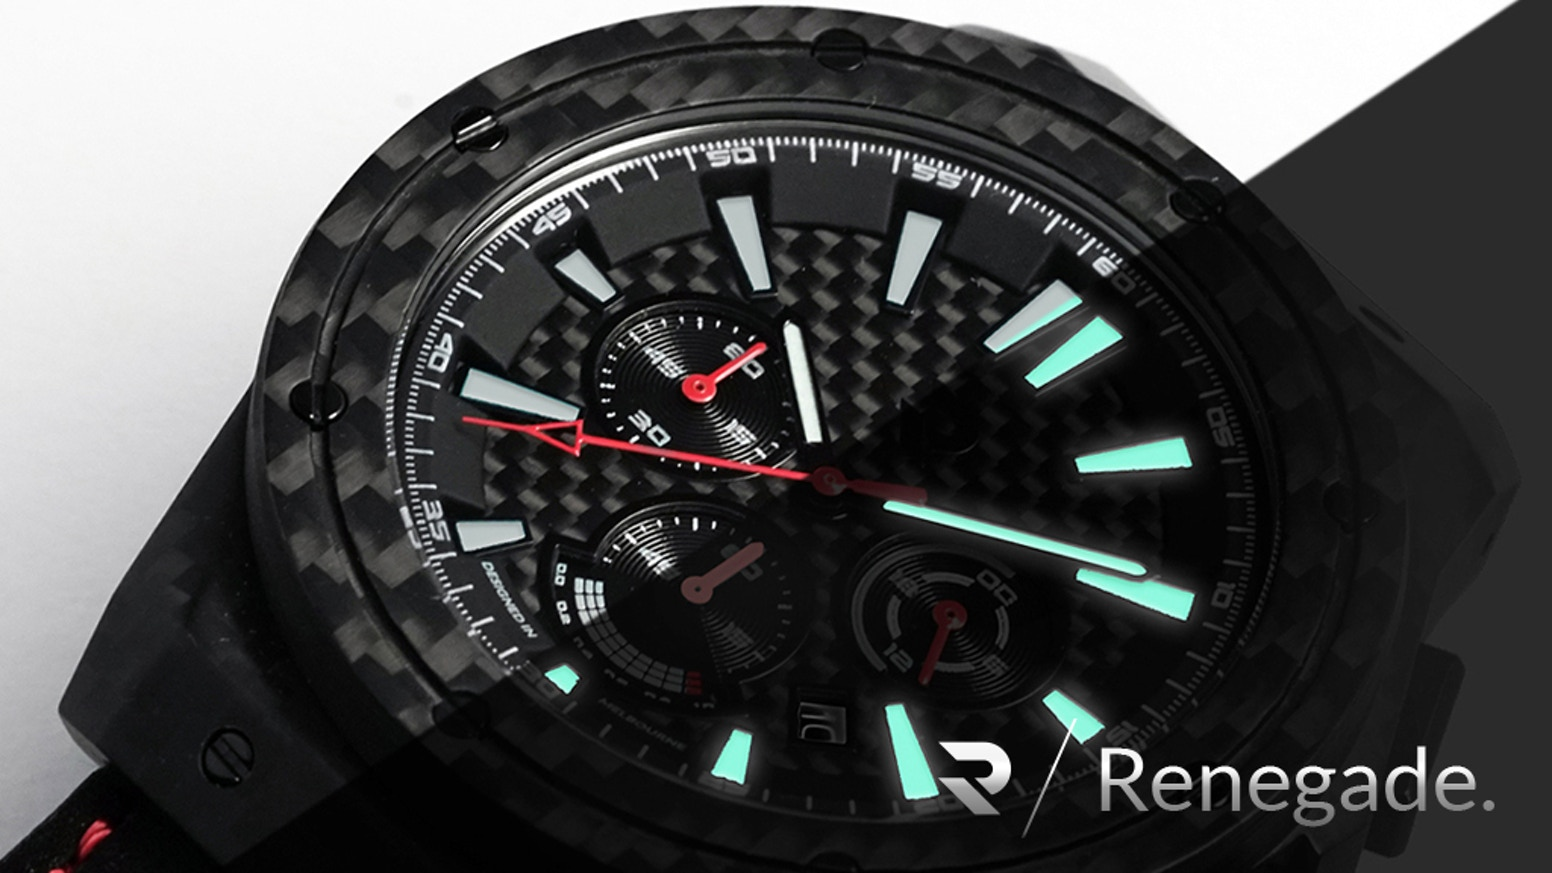 Minimalist Luxury Watches, Carbon Fiber Case, Dial, Bezel, Unique Straps, Bundled w/Travel Roll Case - FREE. Exclusive to Kickstarter.